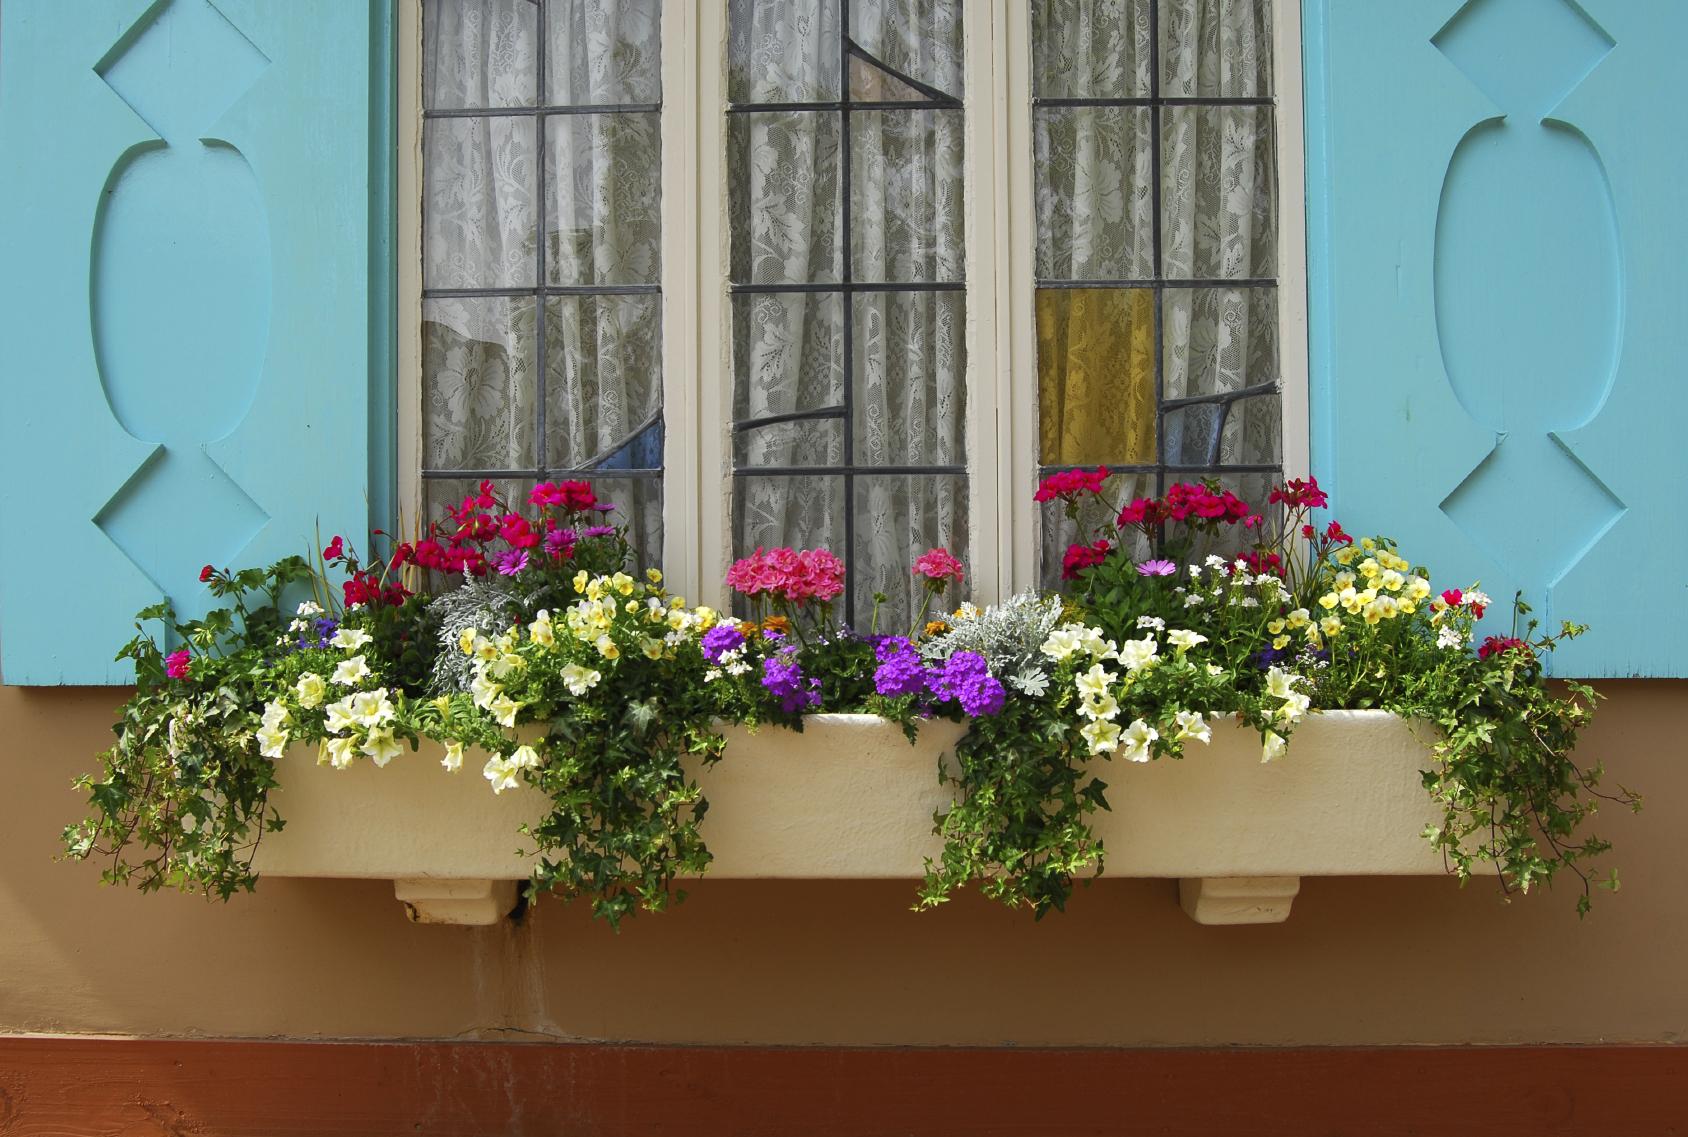 #643C23 Window boxes' jardines en tu ventana Univision 610 Janelas En Vidros